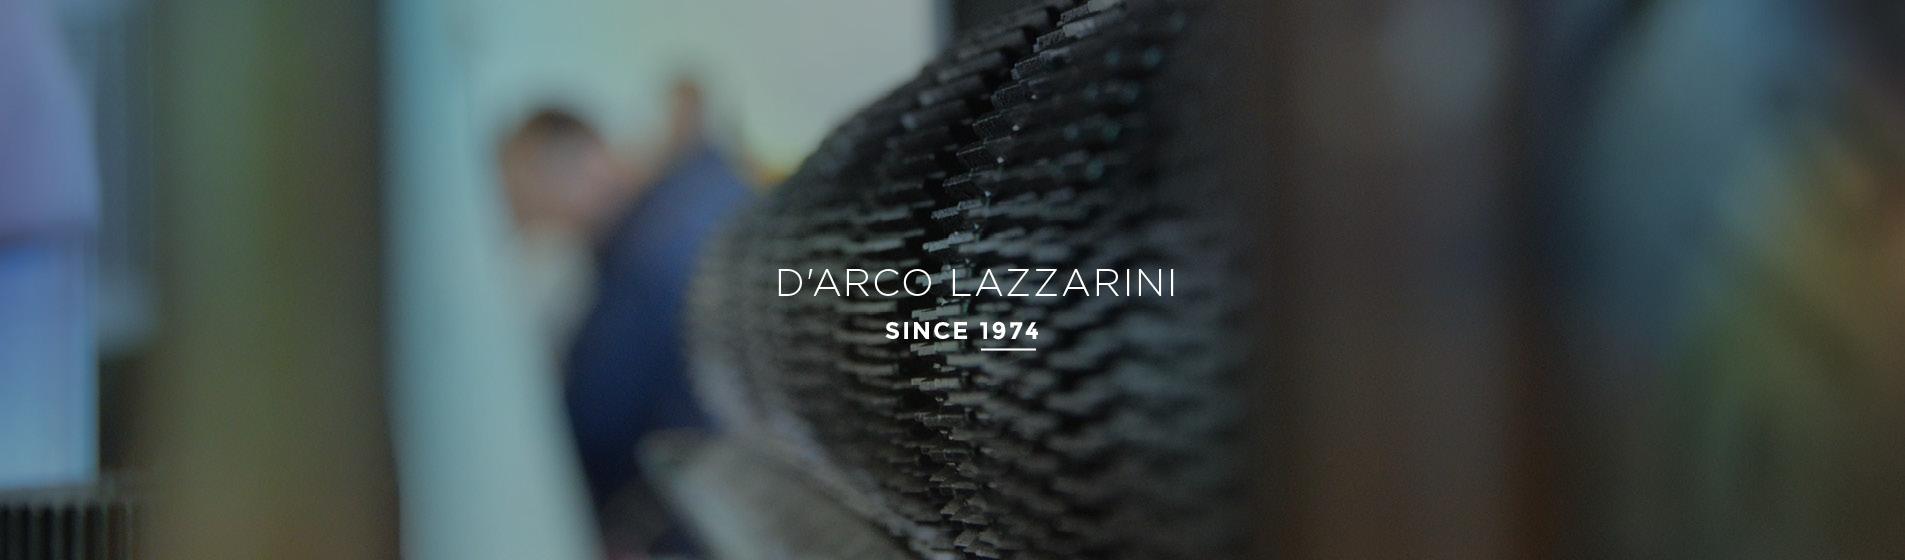 D'arco Lazzarini alberi scanalati Banner Logo